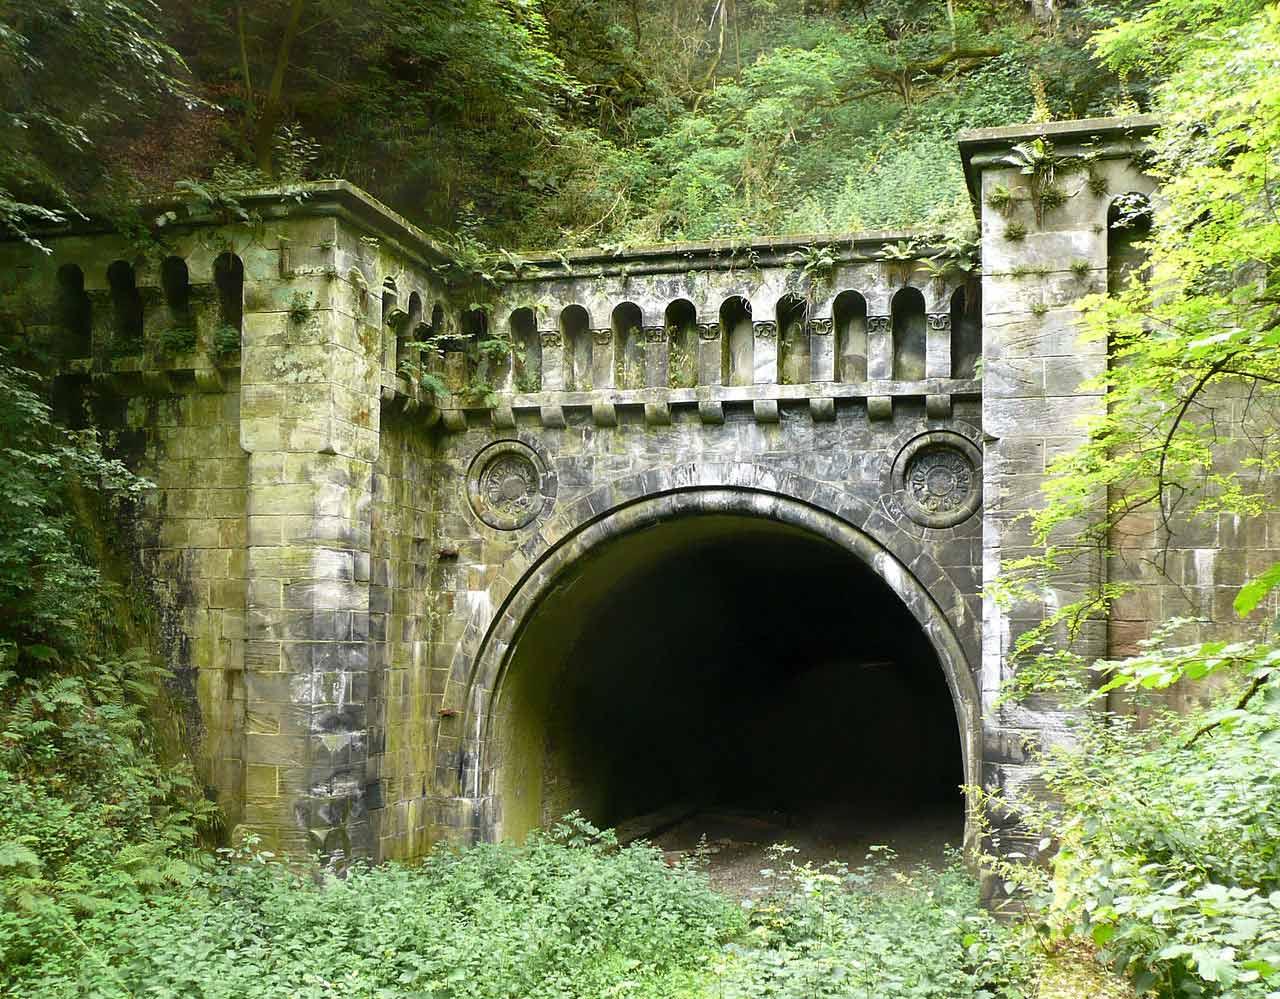 Karte Anfahrt Adresse Volkmarshäuser Tunnel